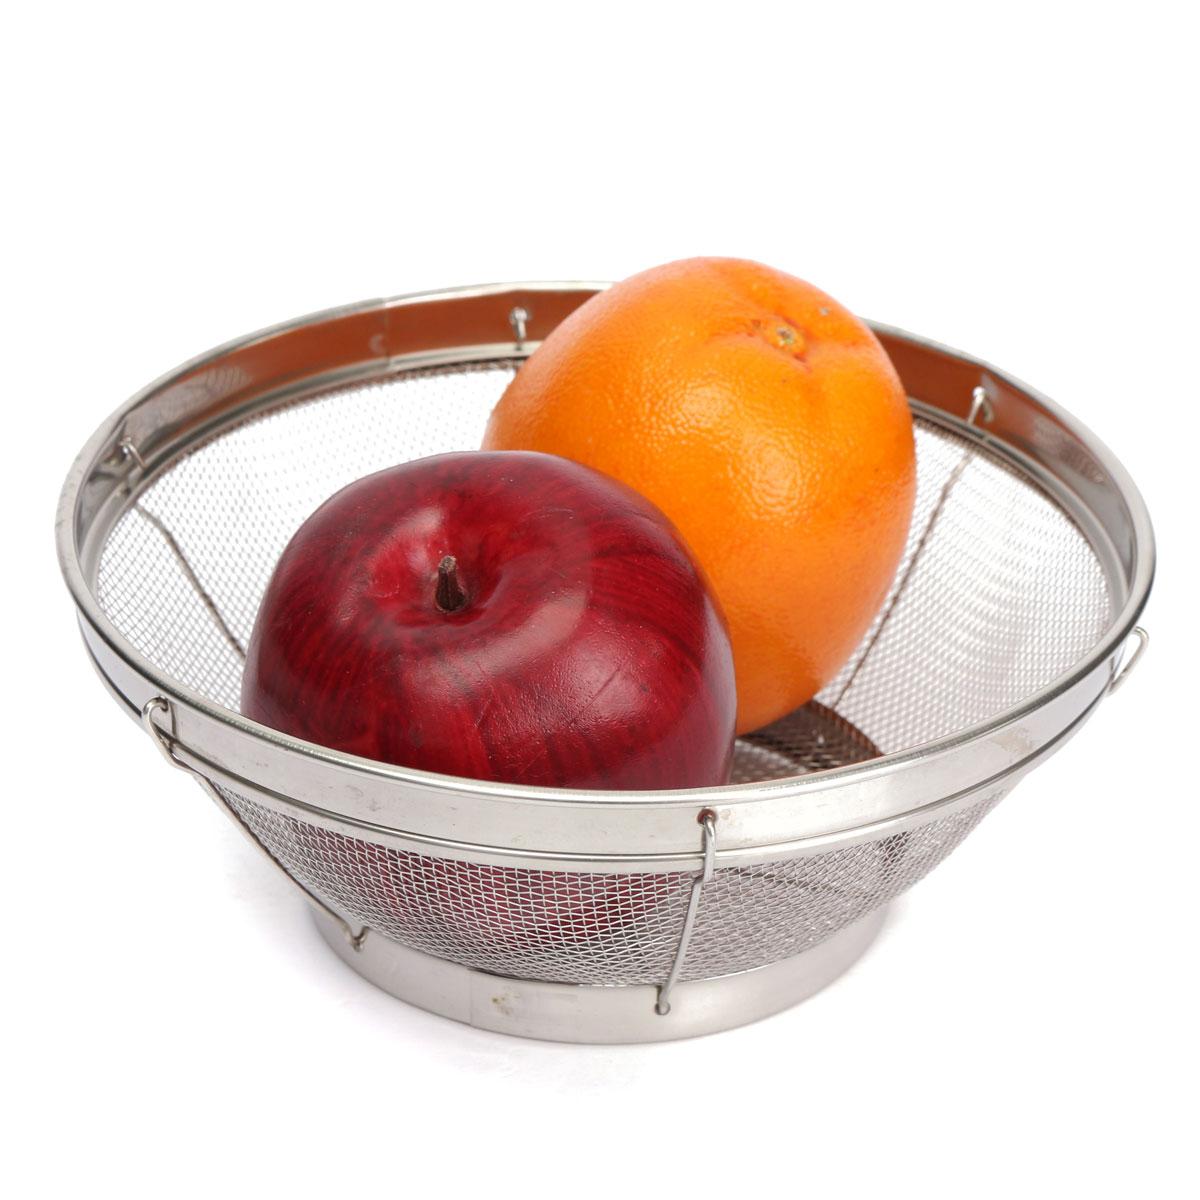 4 Size Design Household Put Fruit Vegetable Basket Stainless Steel Drain Plate Kitchen Storage Food Bowl Holder(China (Mainland))